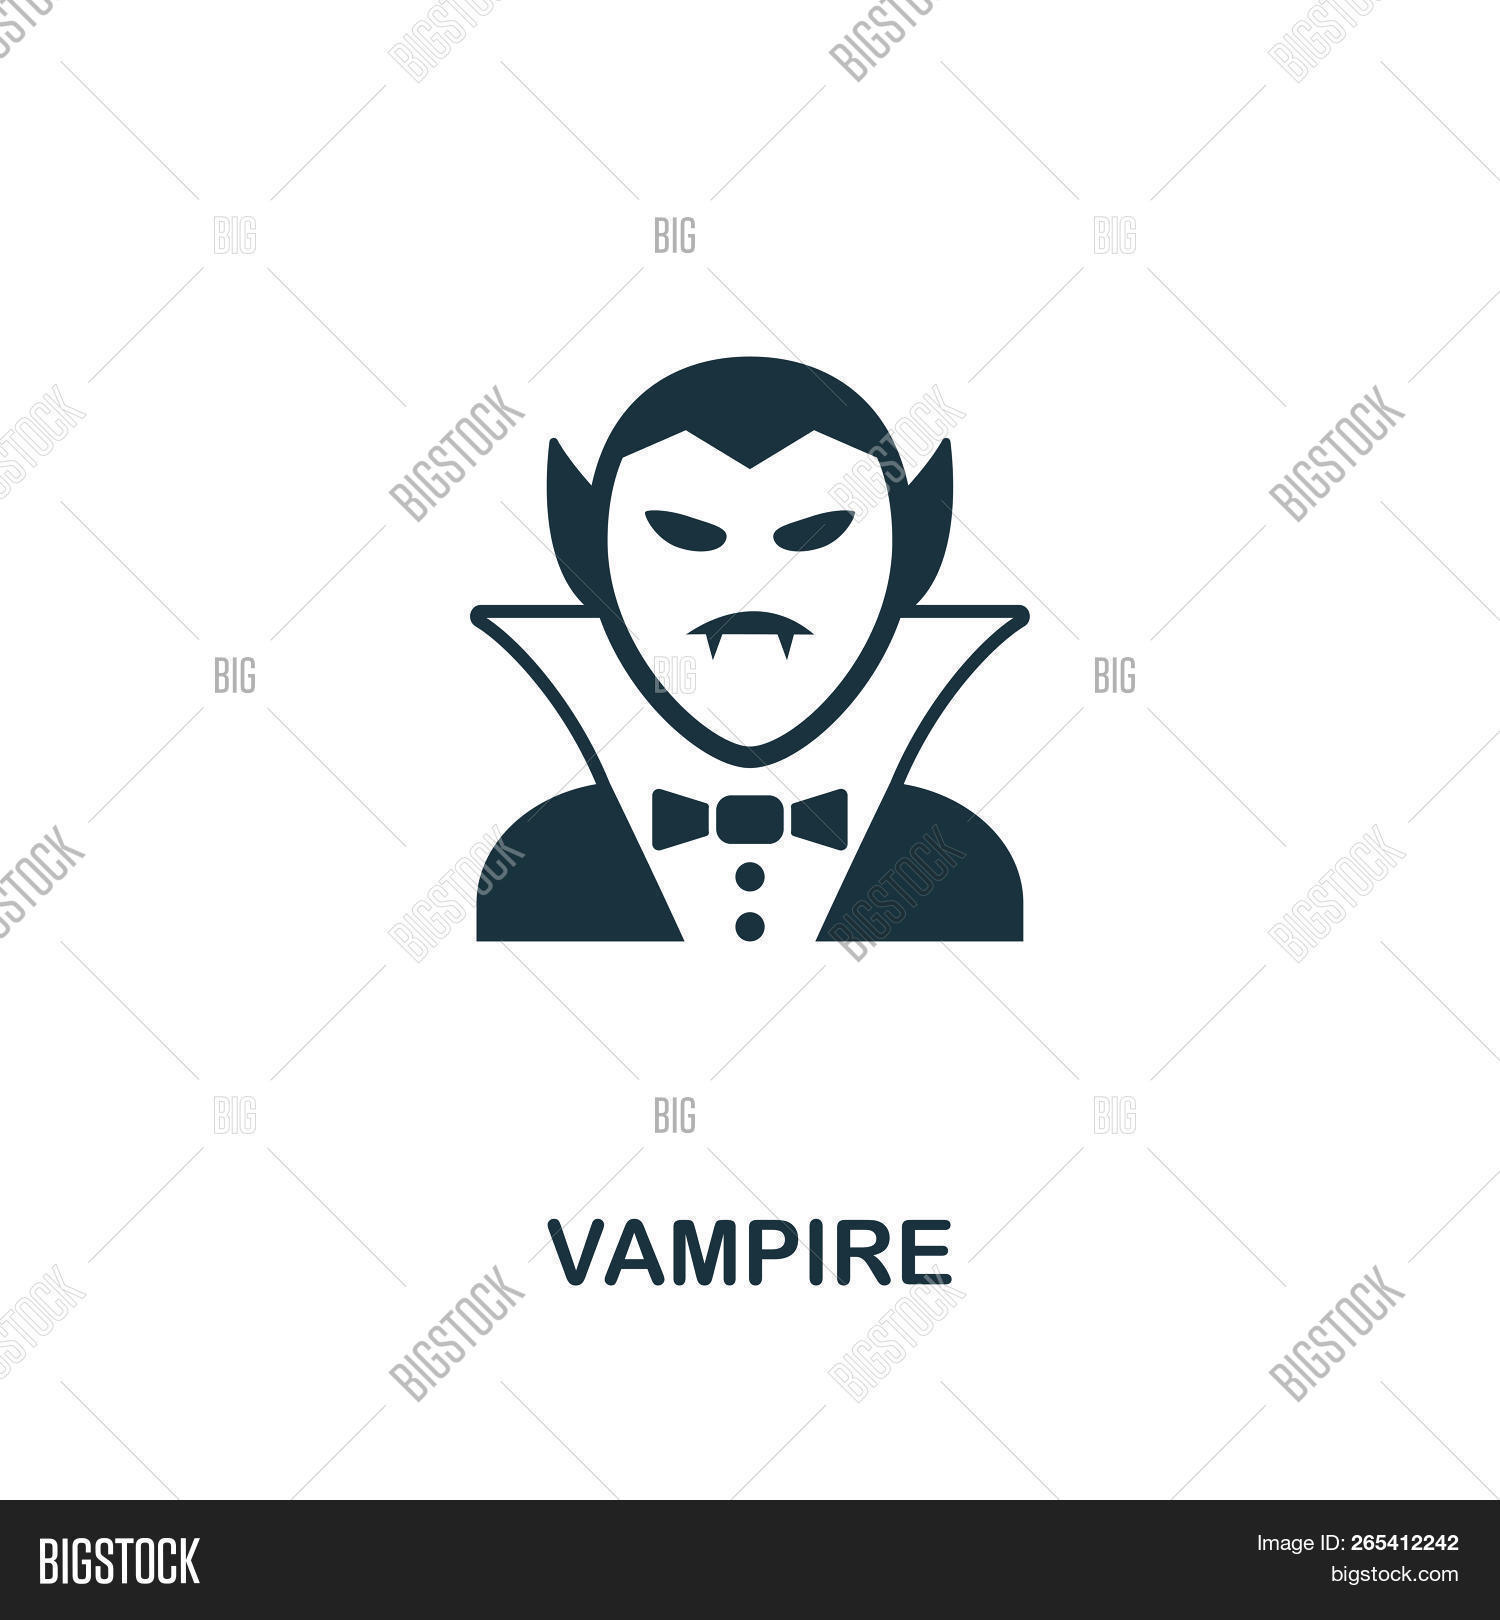 Vampire Icon Premium Image Photo Free Trial Bigstock